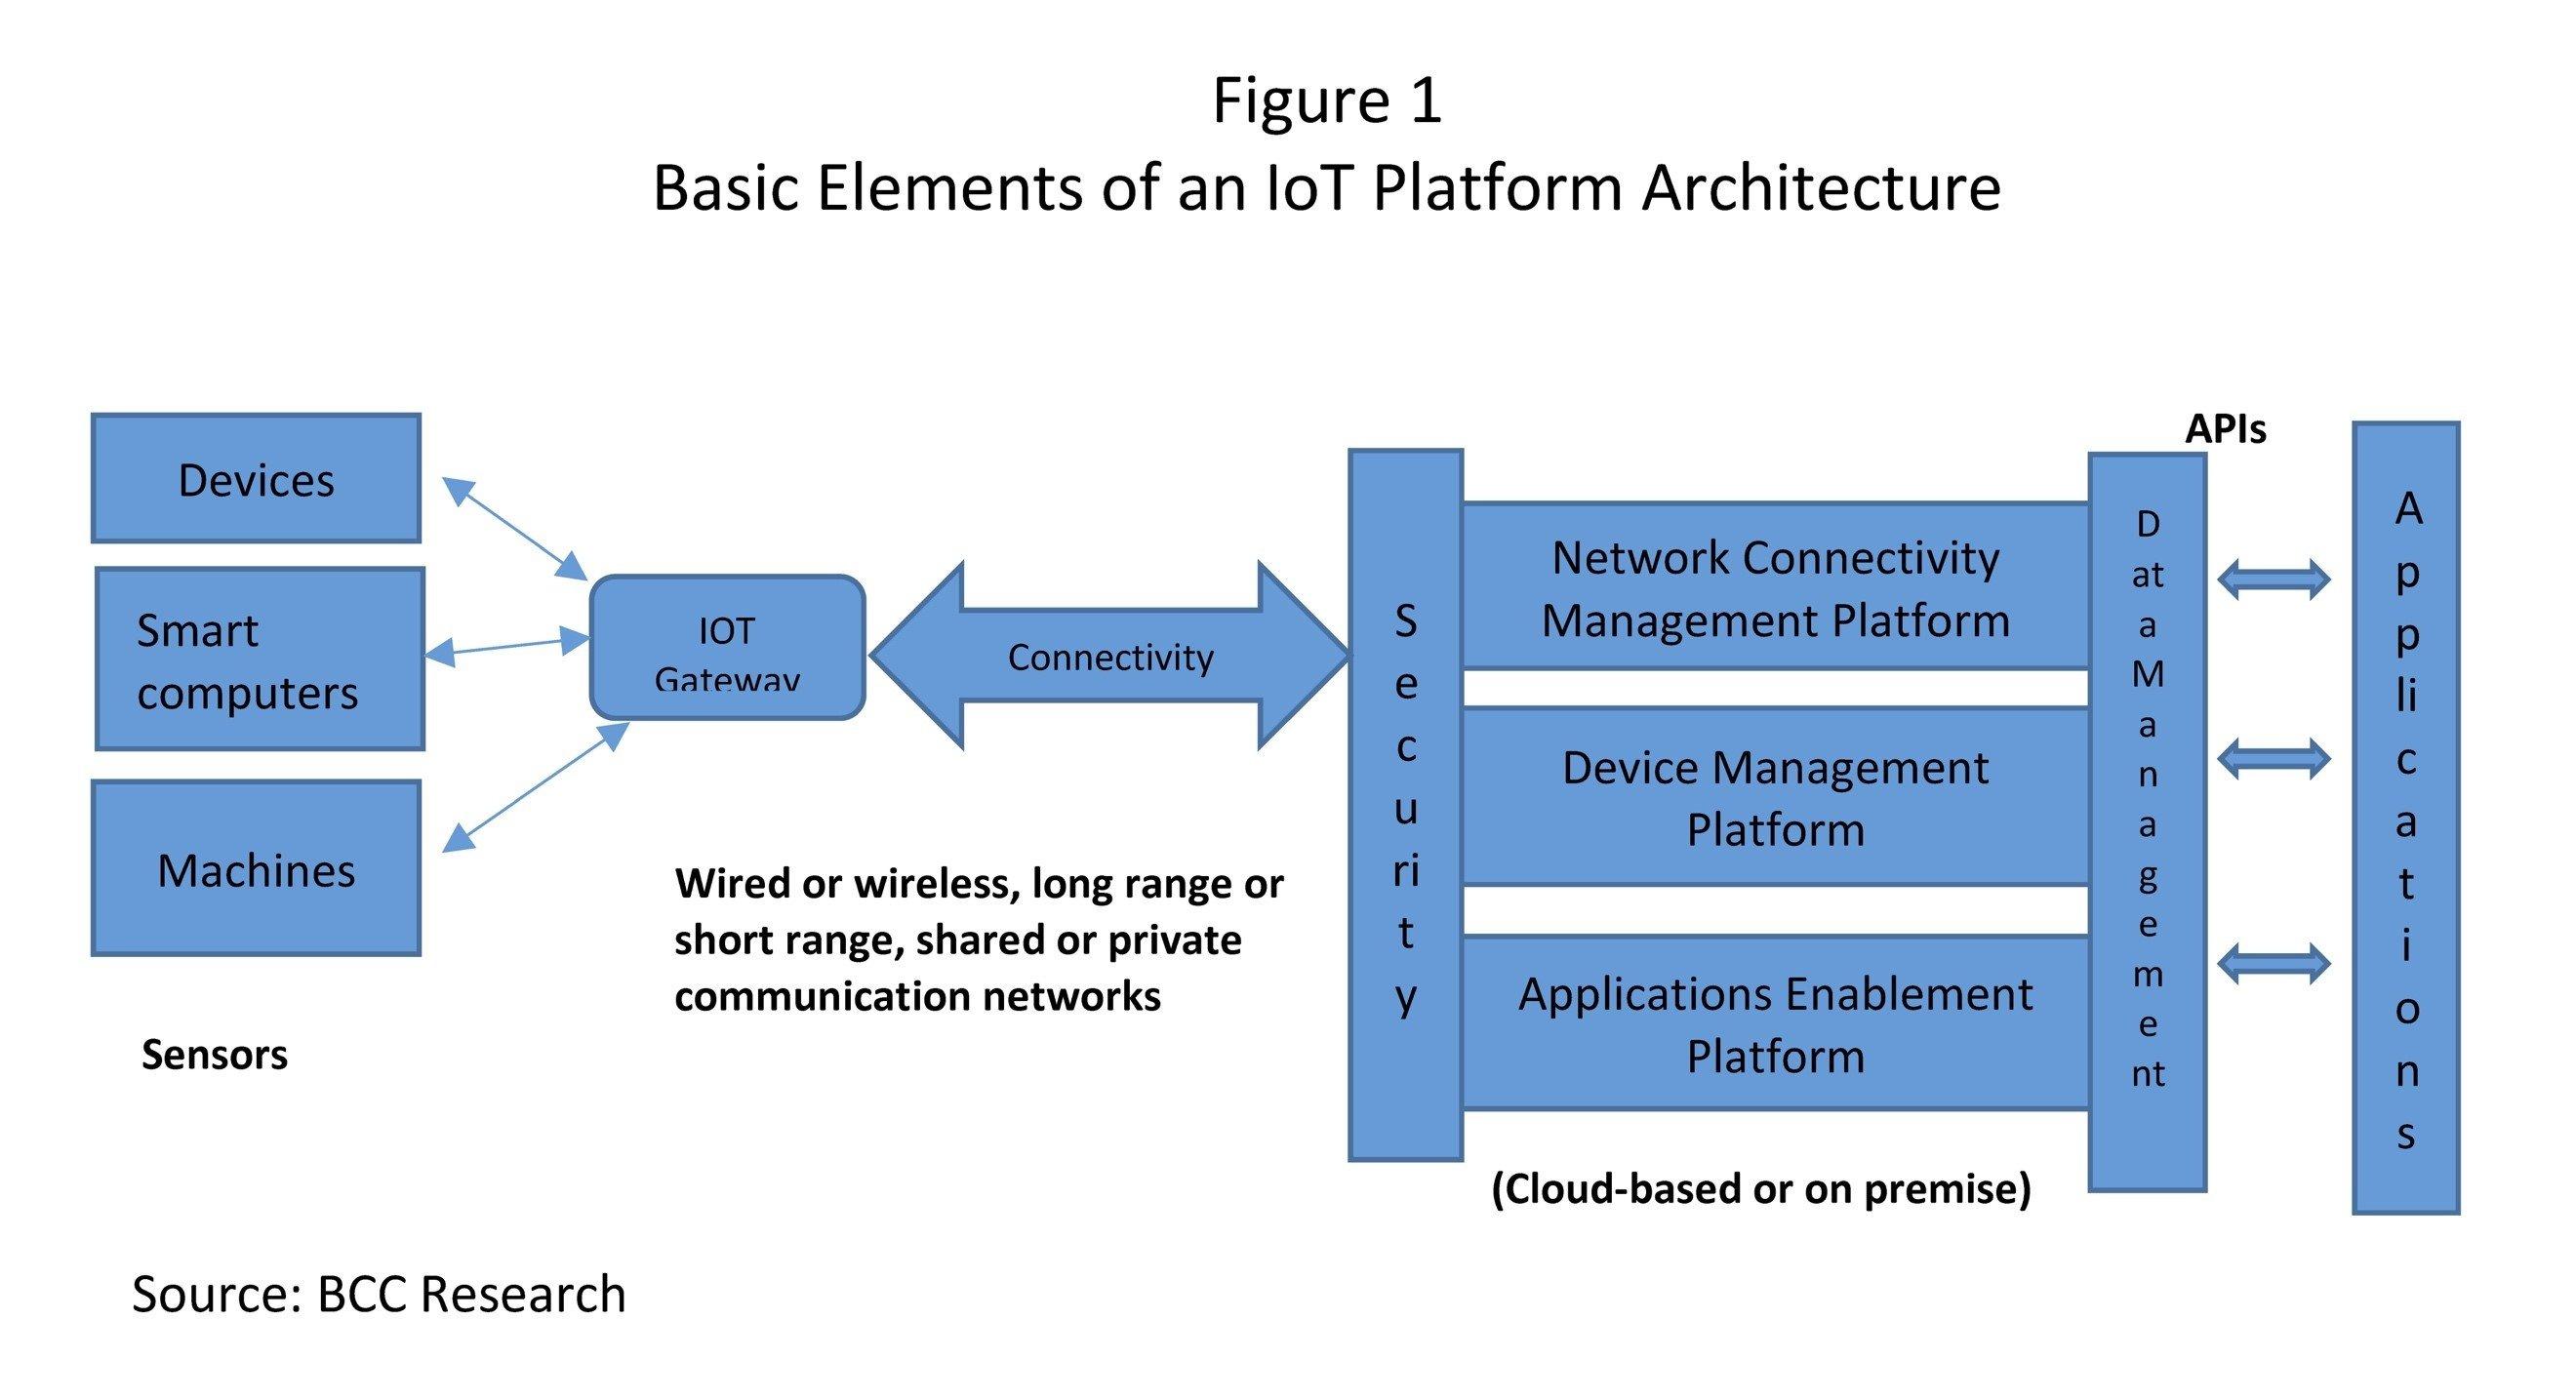 Basic element of an IoT Platform Architecture